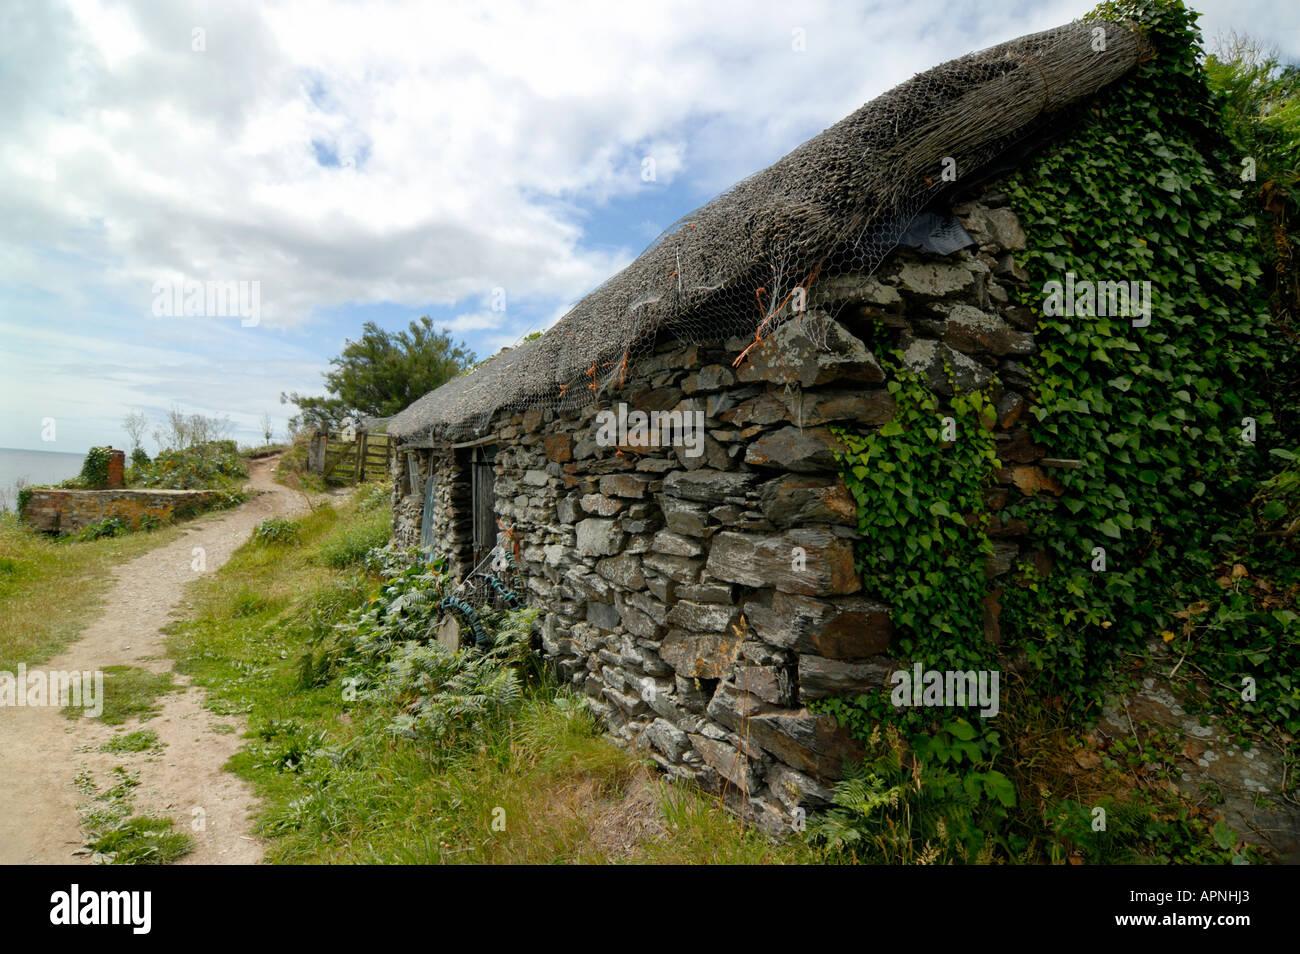 Fishermen s hut at Prusia Cove Prussia Cove Cornwall England - Stock Image